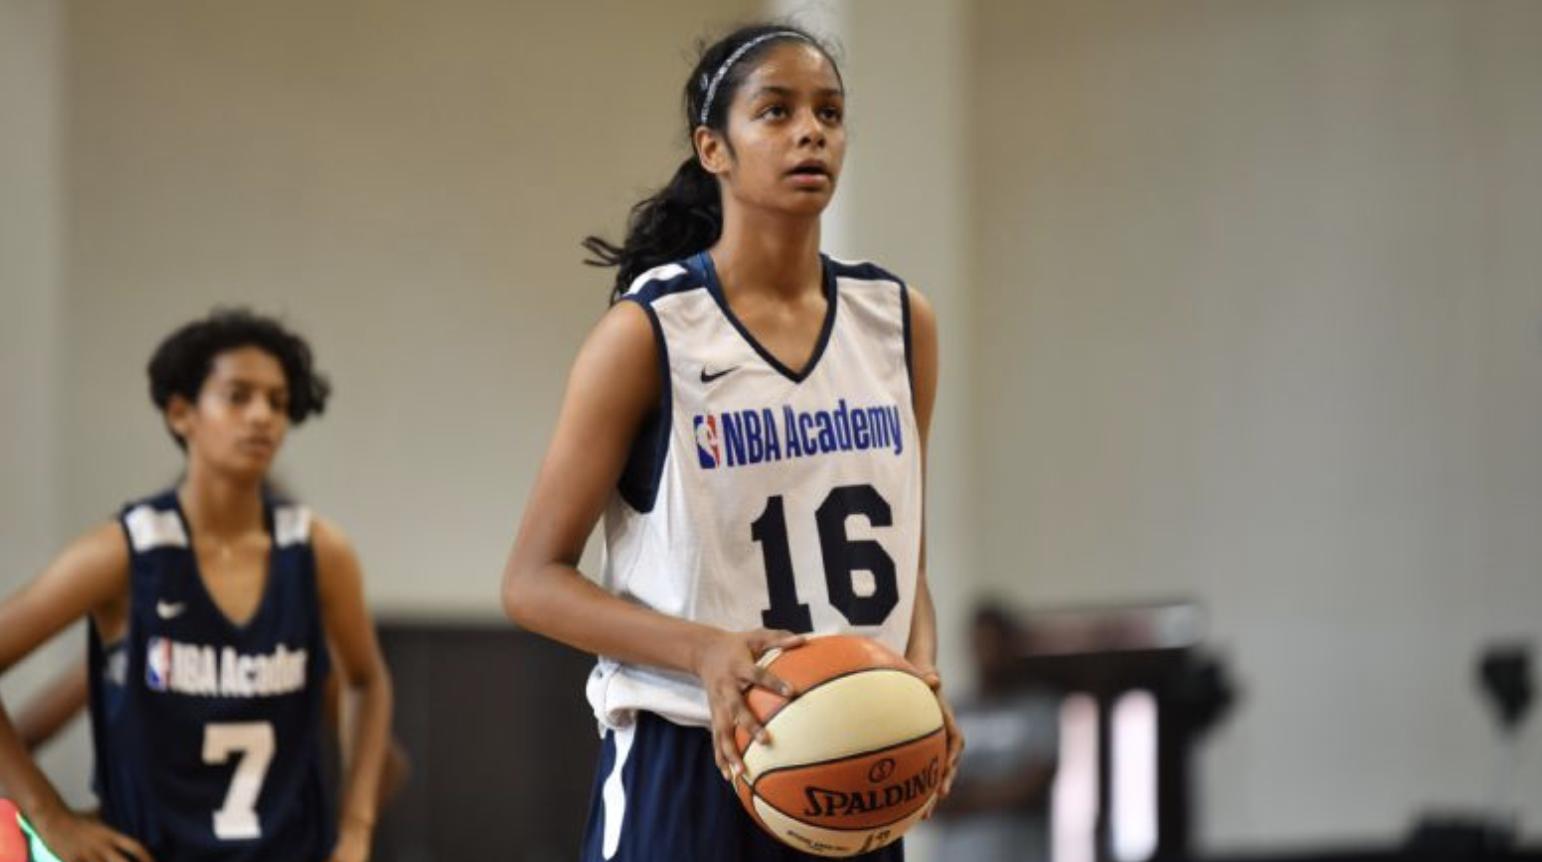 From India to Northern Arizona, Sanjana Ramesh makes history during NCAA early signing period -